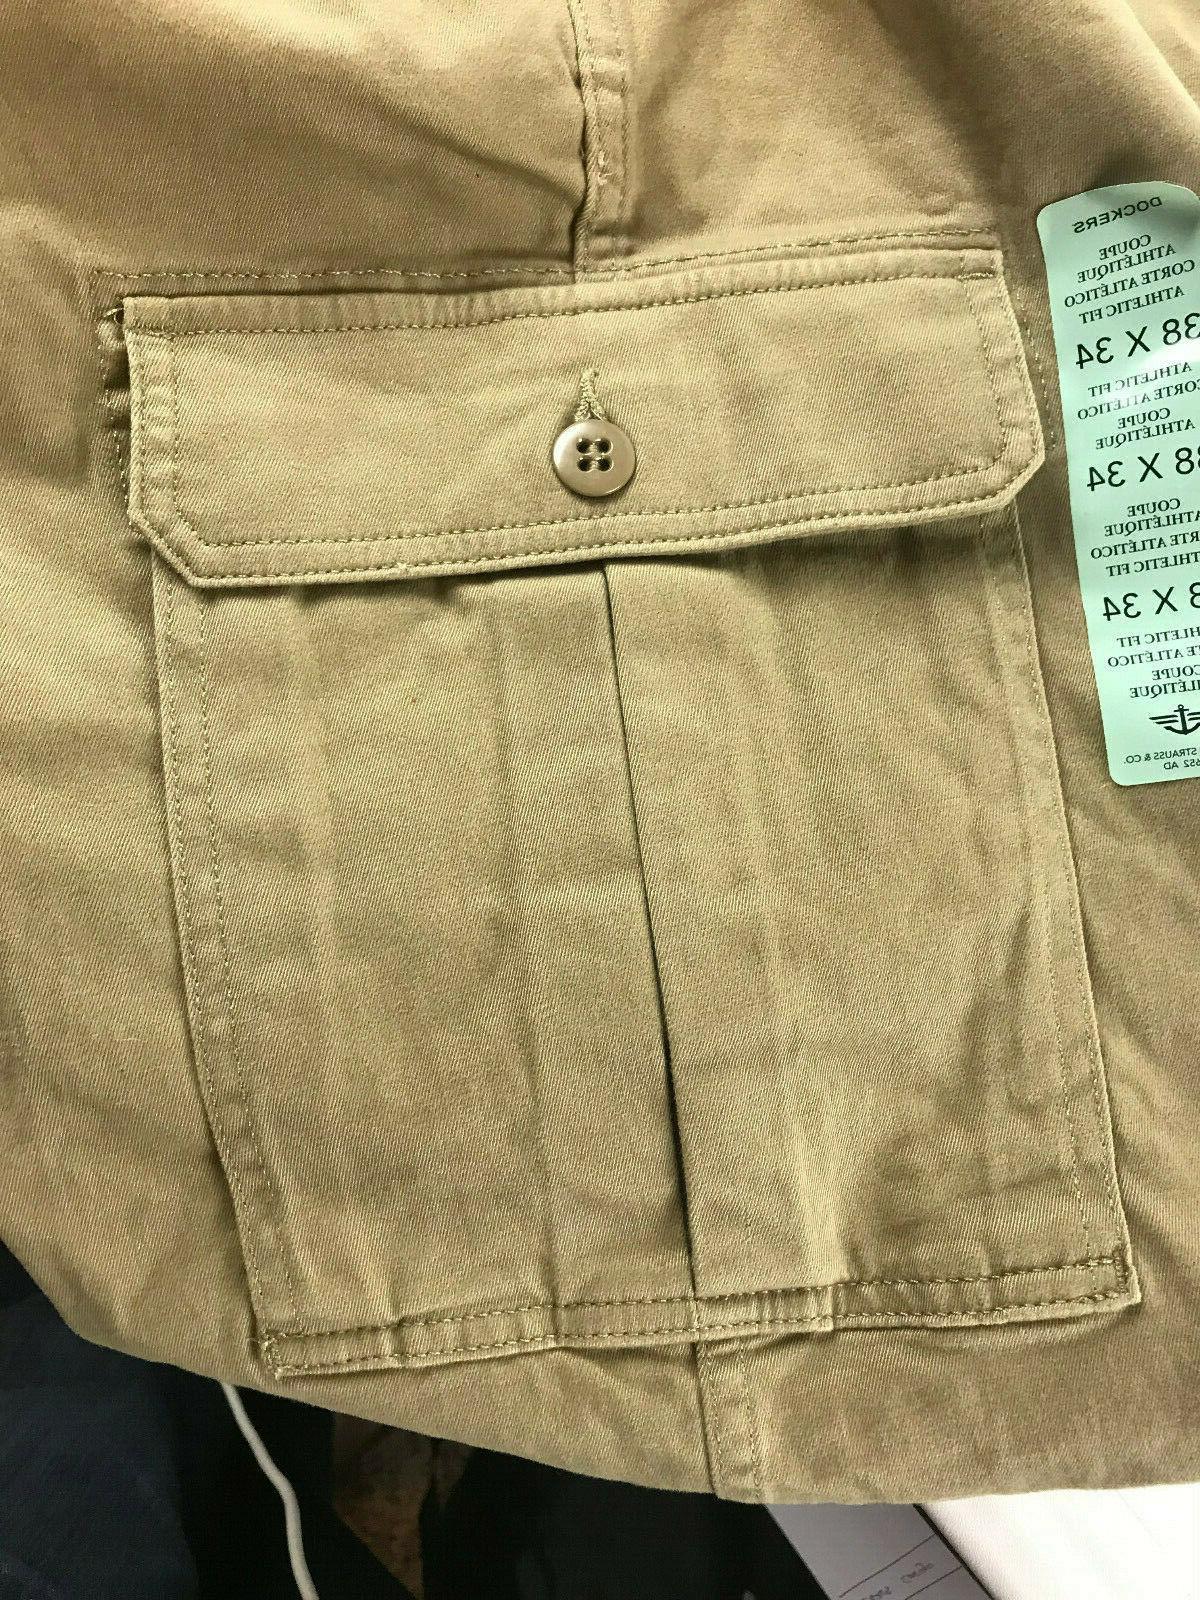 Dockers Cargo pants 38X34